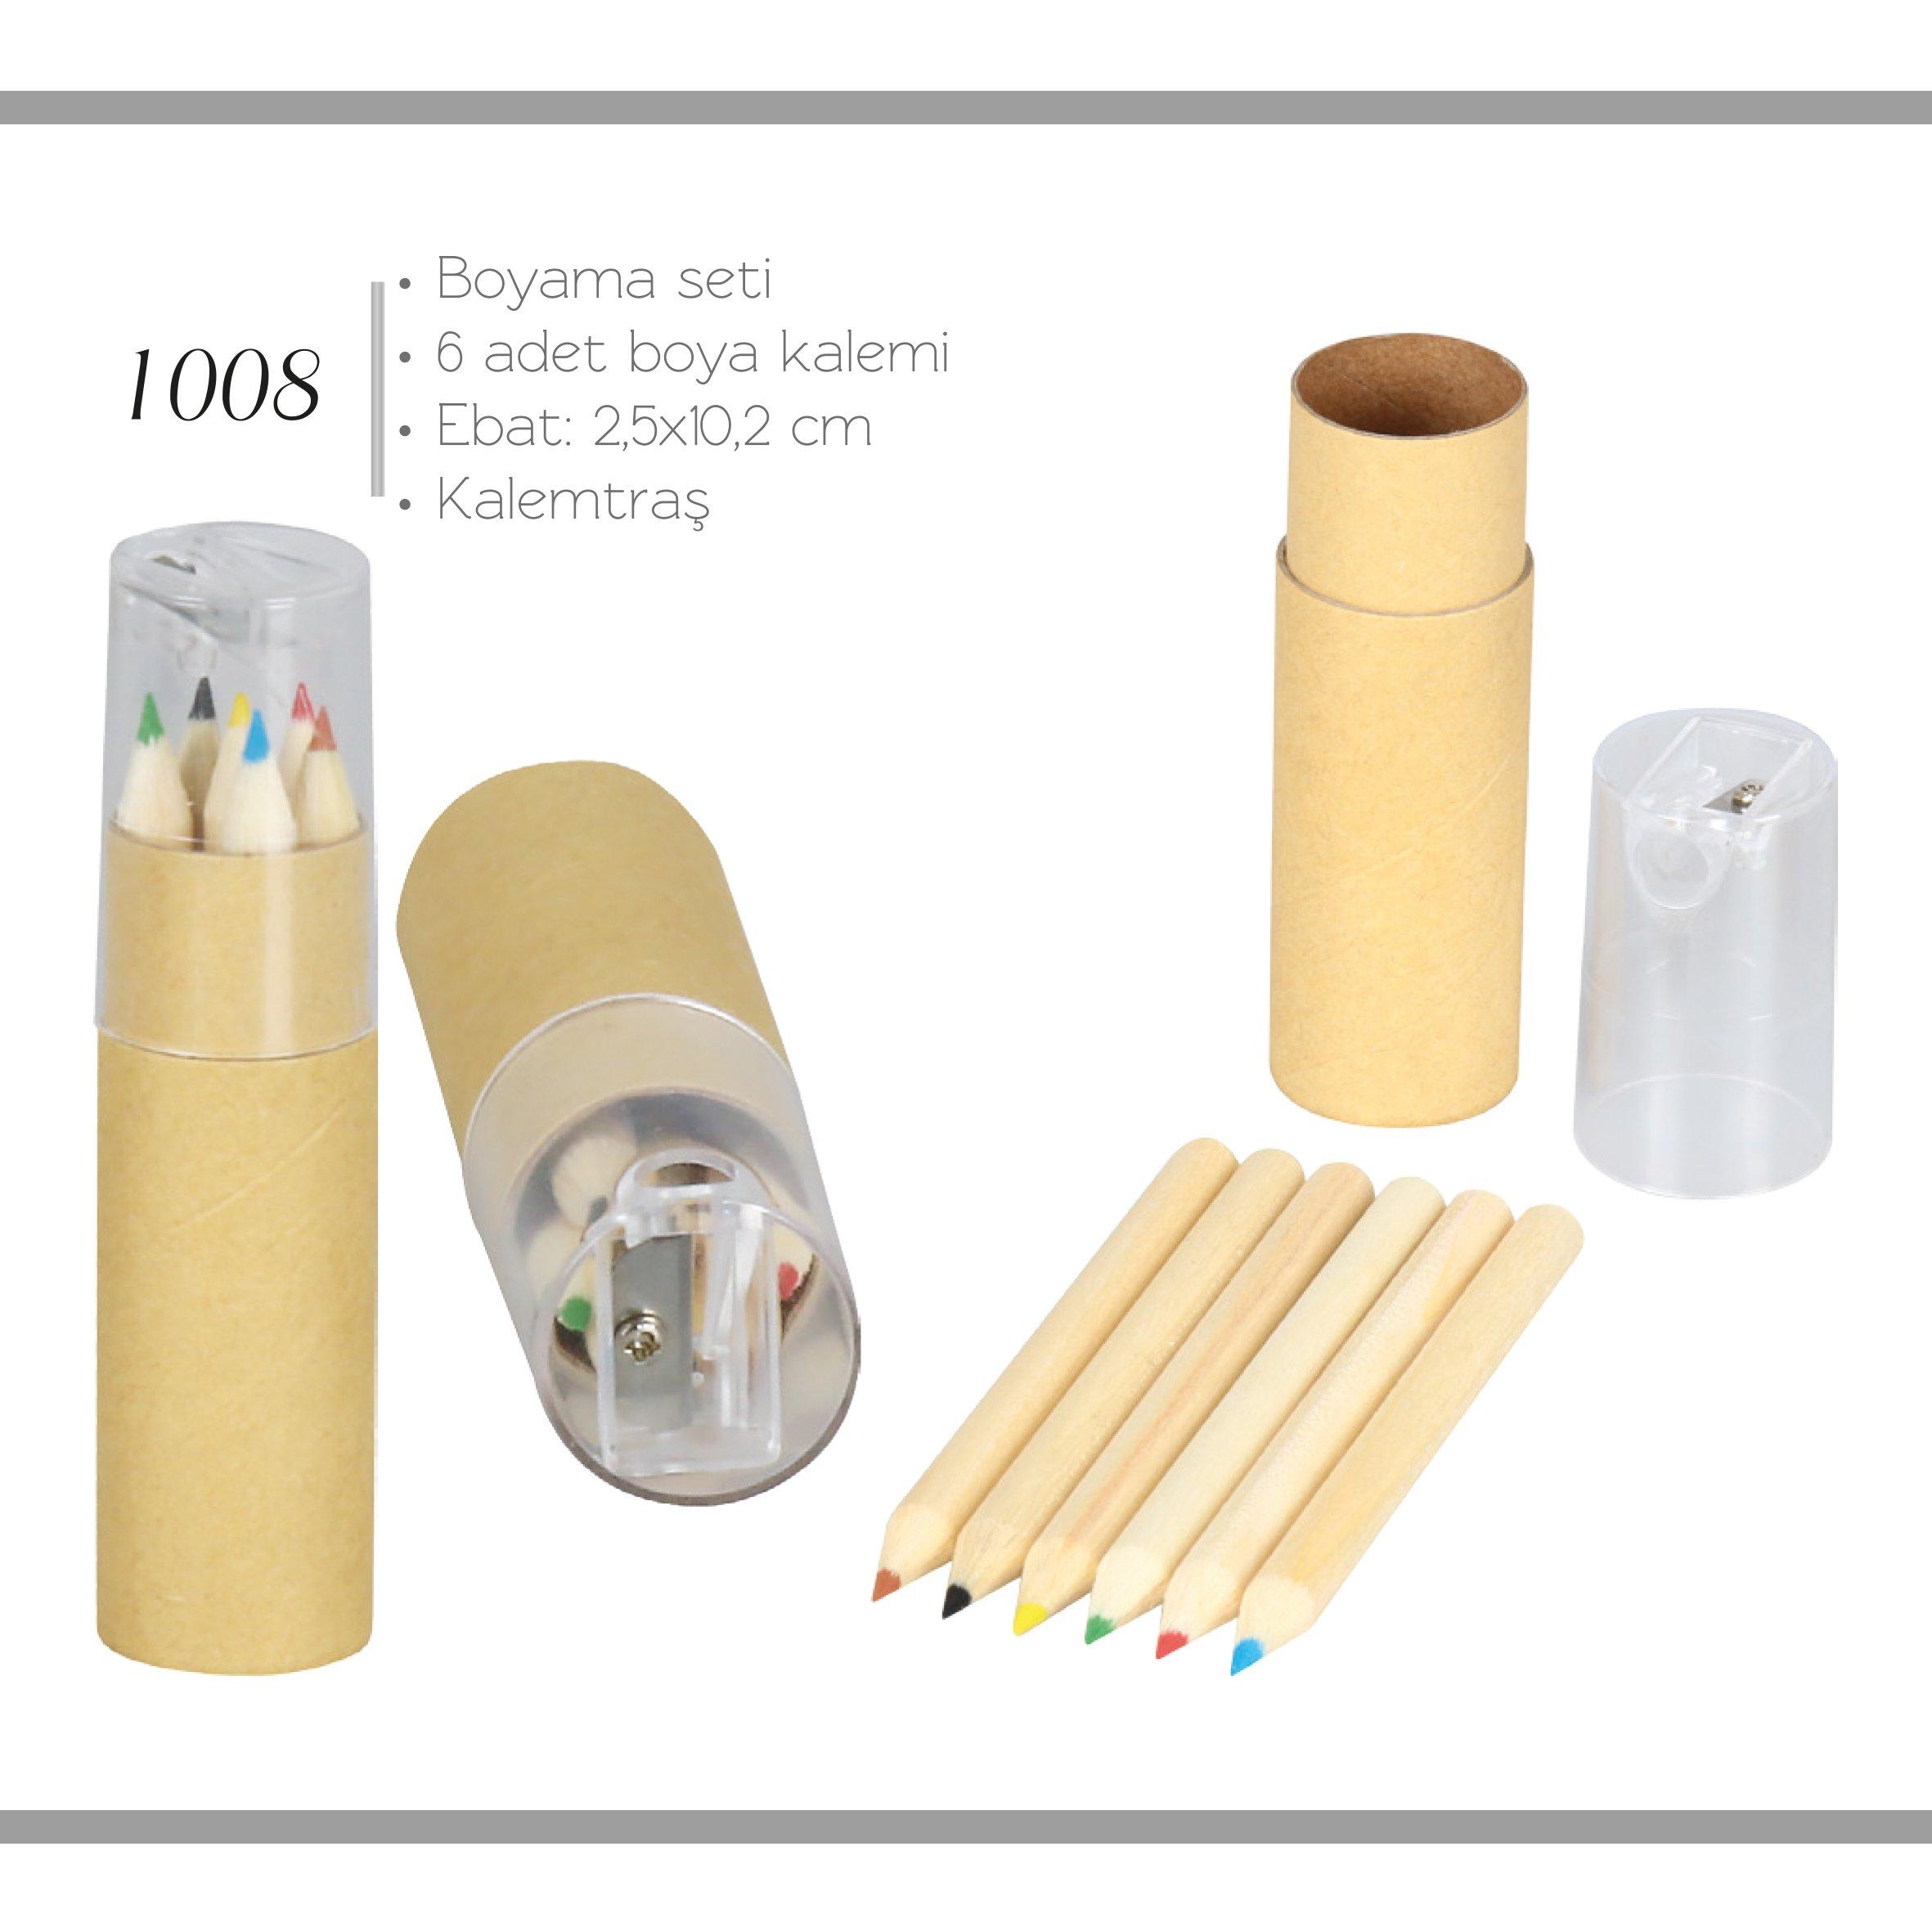 promosyon-promosyon ürünleri-promosyon kalemler-kurşun kalemler-promosyon ahşap kurşun kalem seti 1008